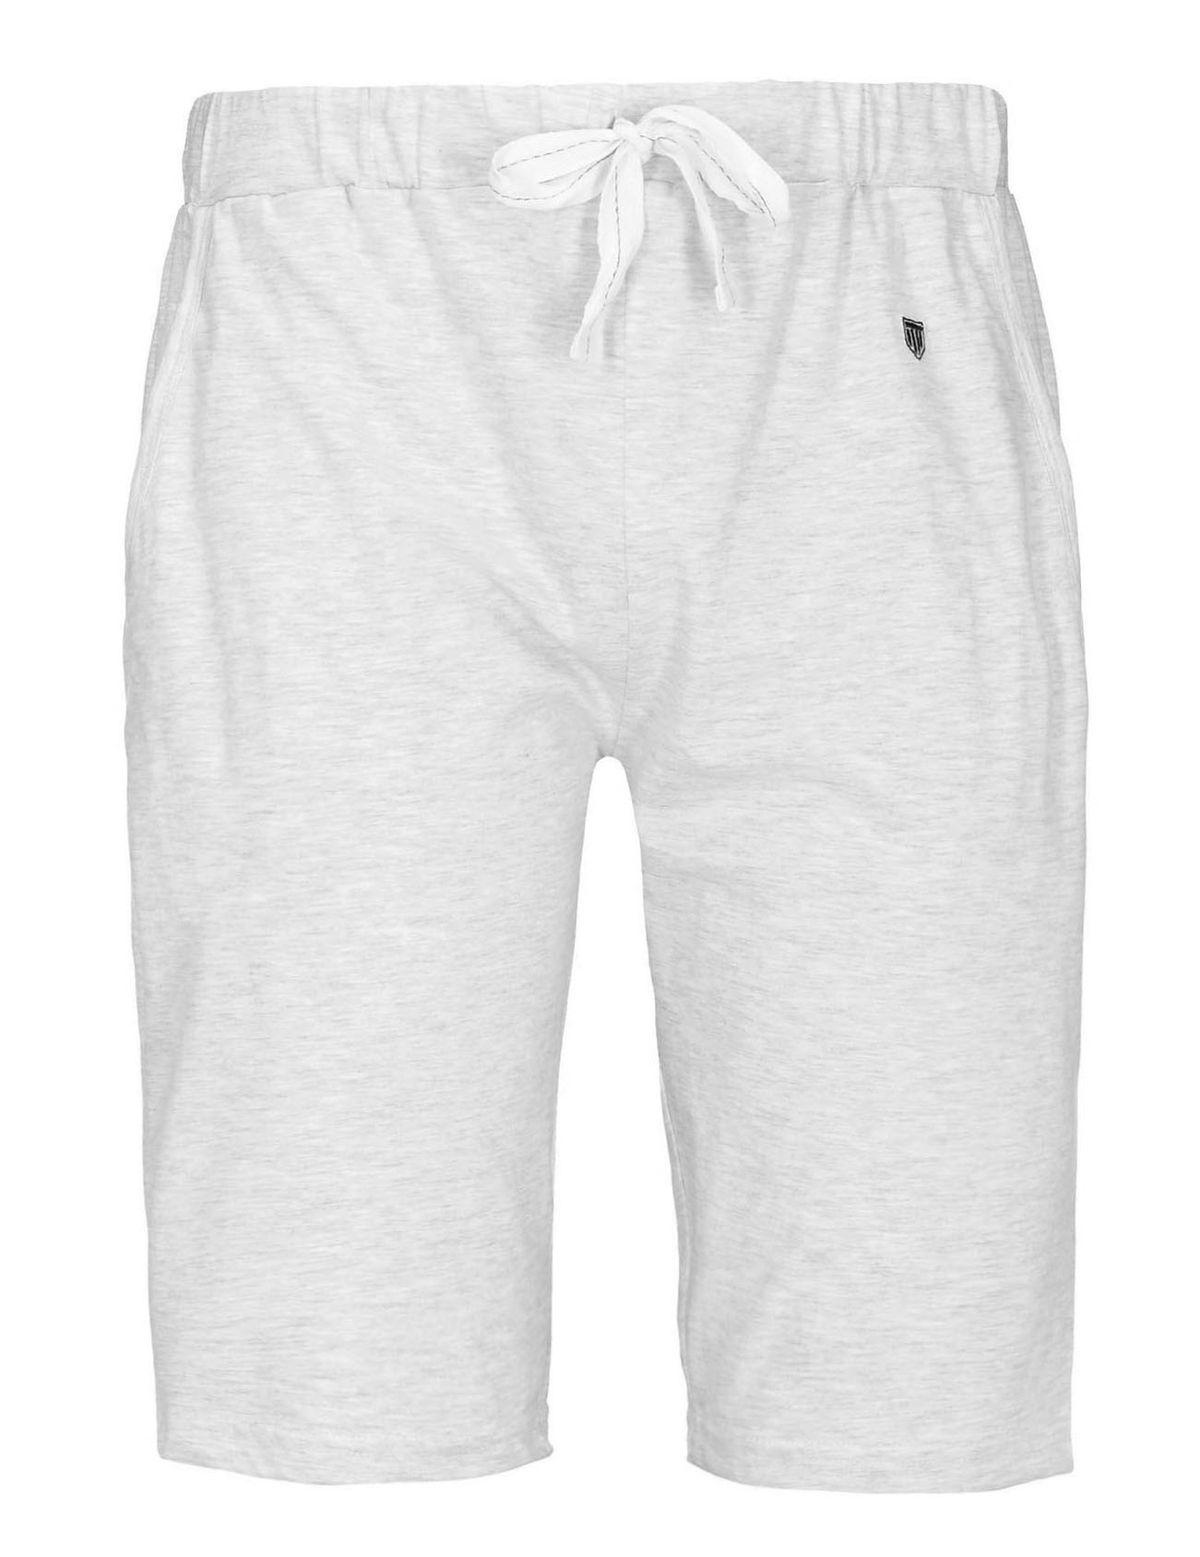 HOMEWEAR Pyjama Shorts mit Tunnelzug - Grey Melange